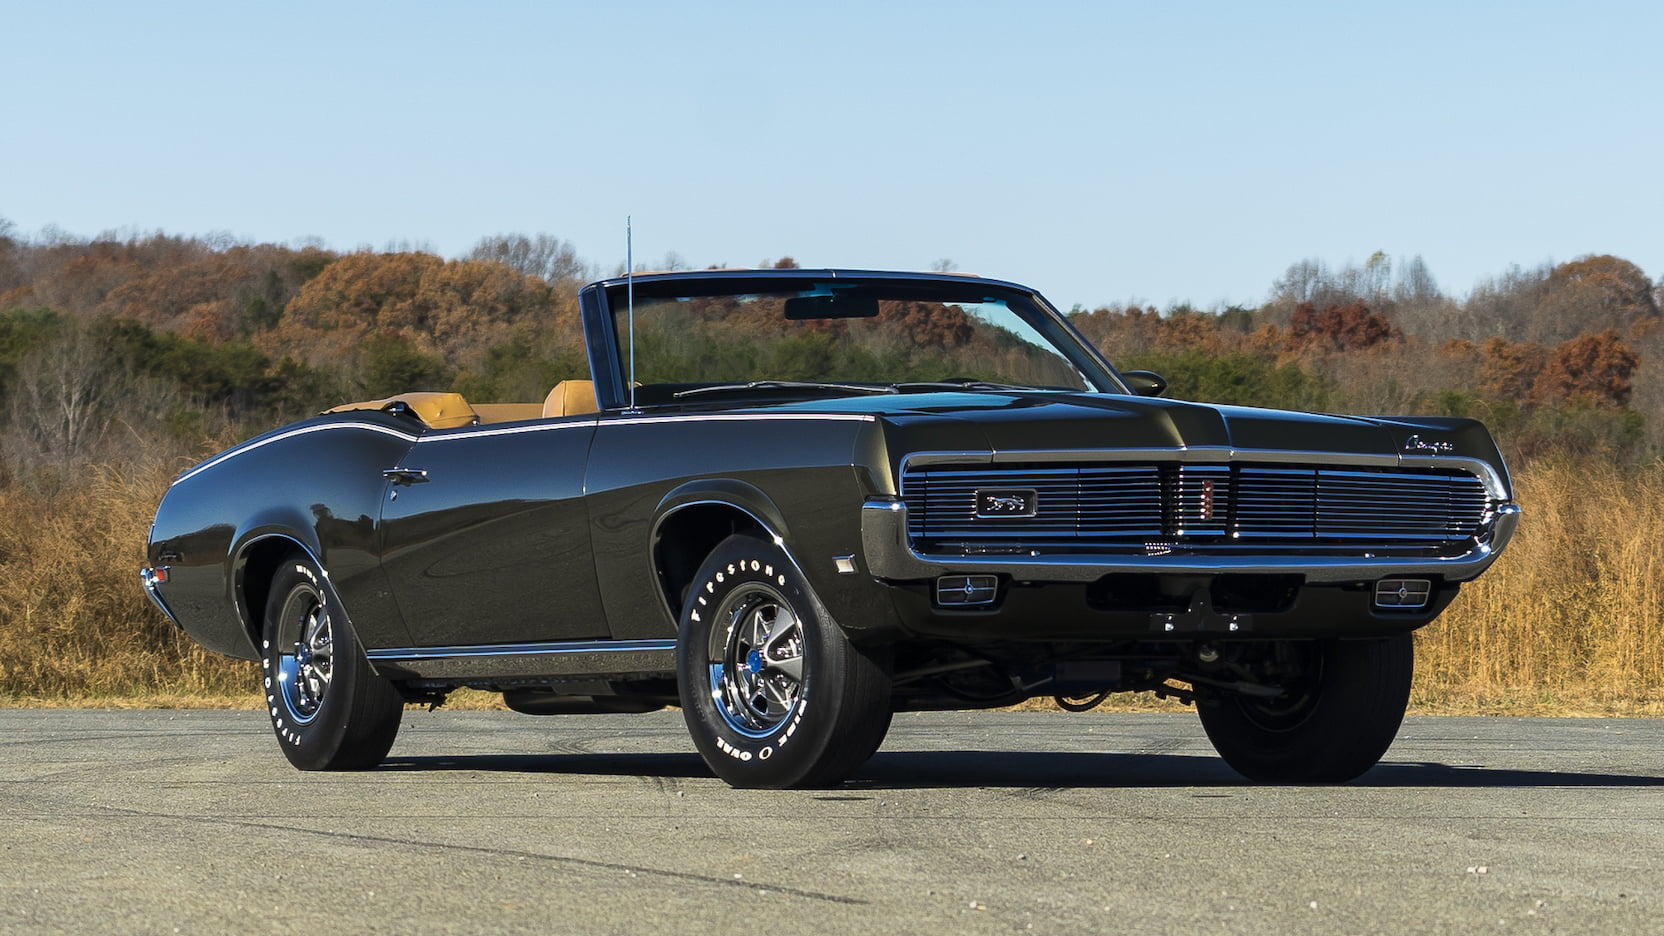 1969 Mercury Cougar 3/4 front